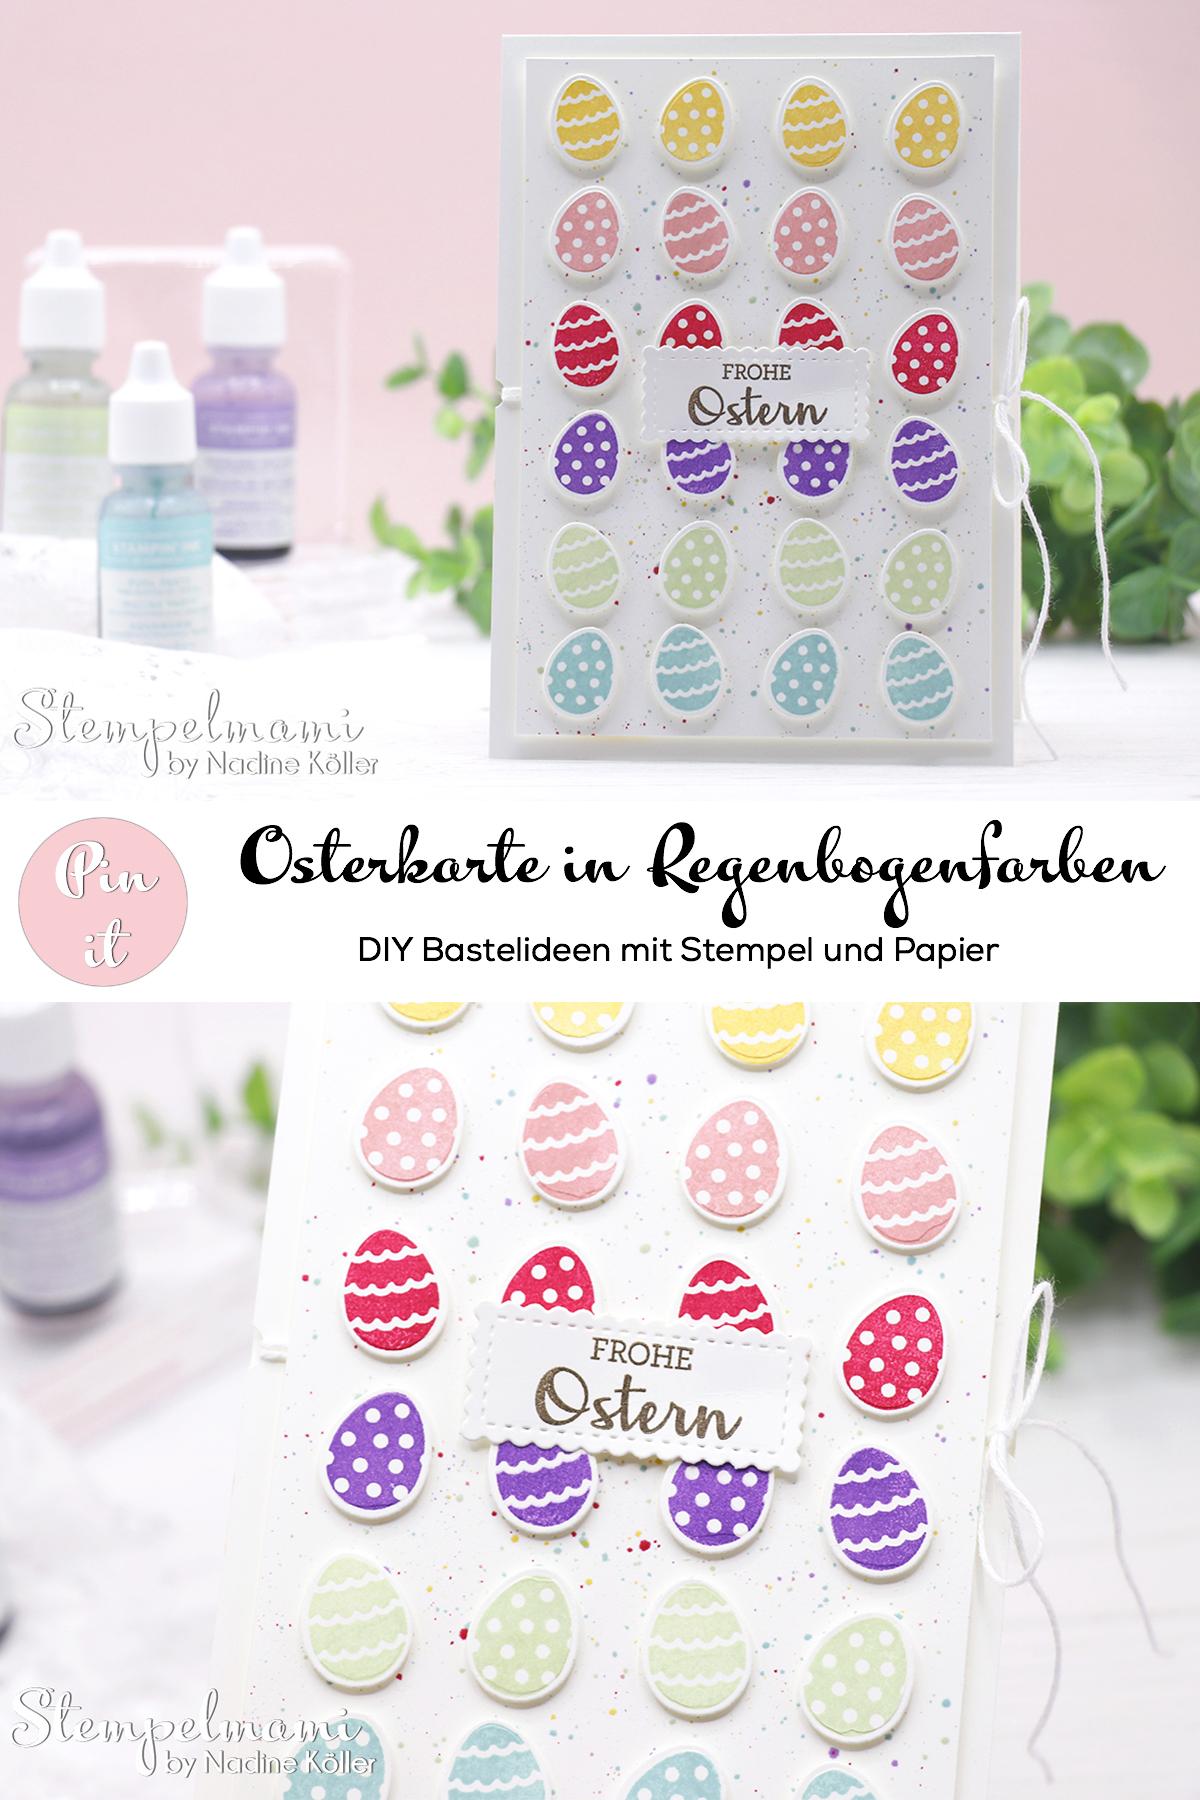 Stampin Up Osterkarte in Regenbogenfarben basteln Produktpaket Kreative Kraenze Stempelmami 3